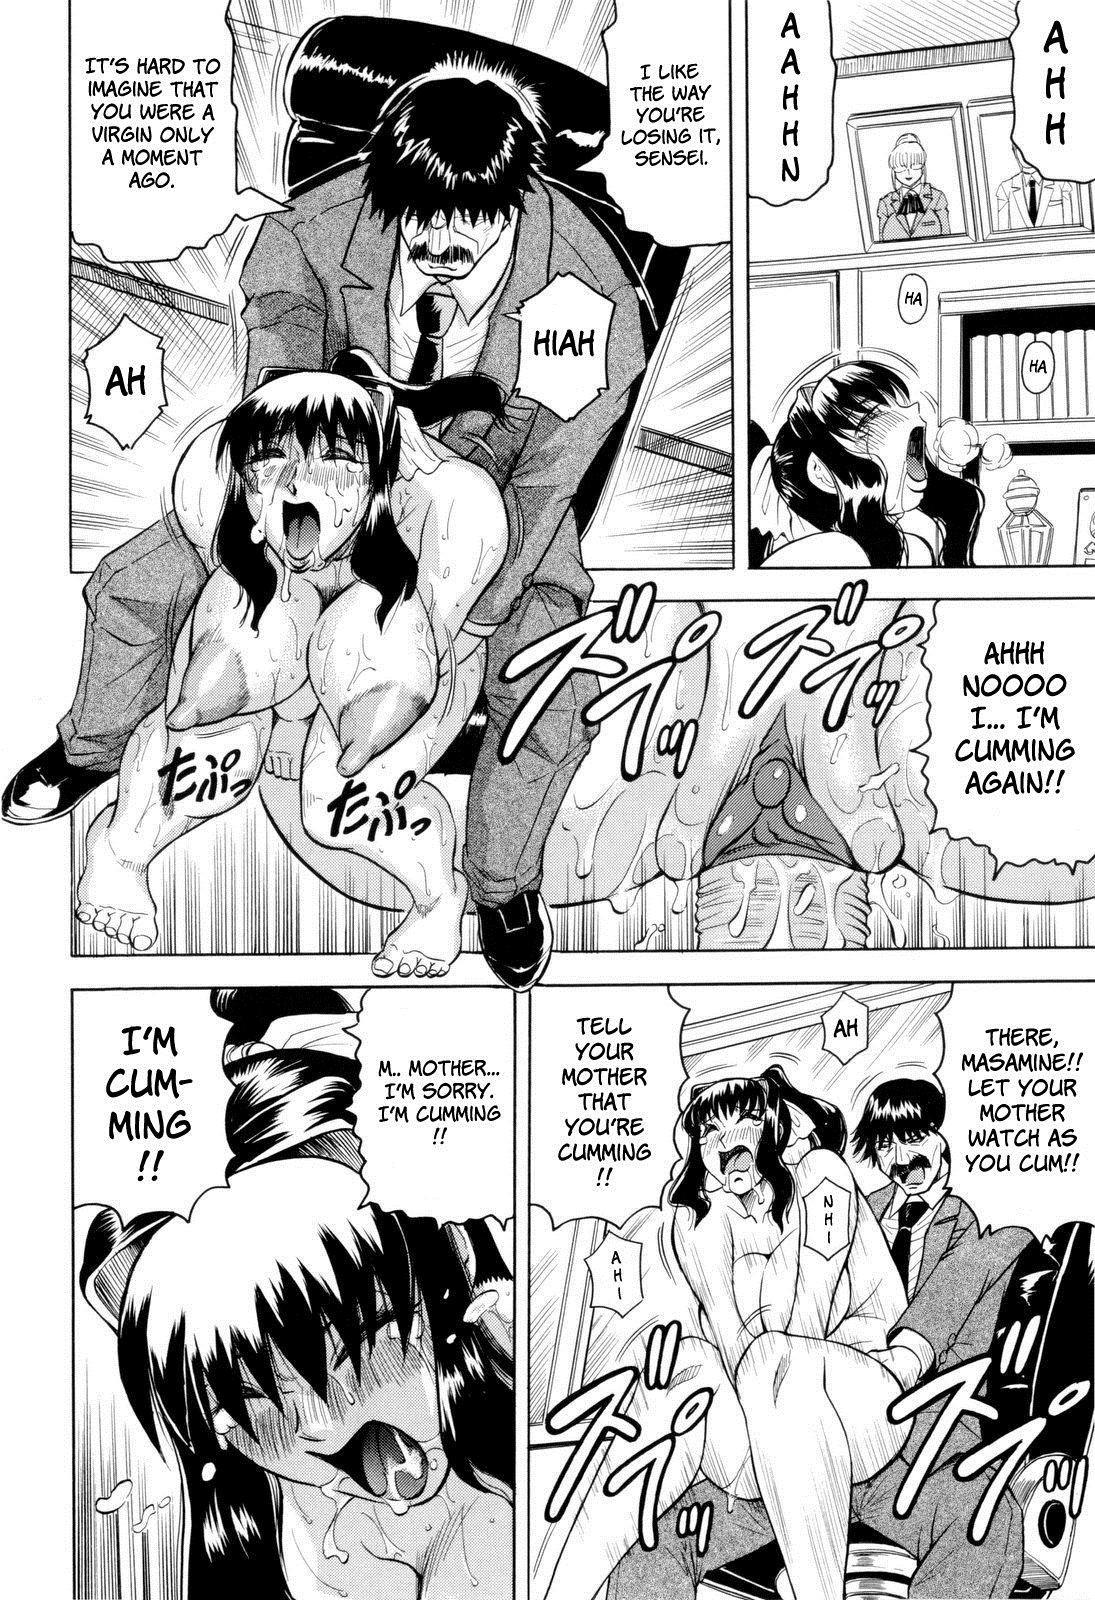 Sensei ni Dashitee! - It ejaculates in the teacher! 143